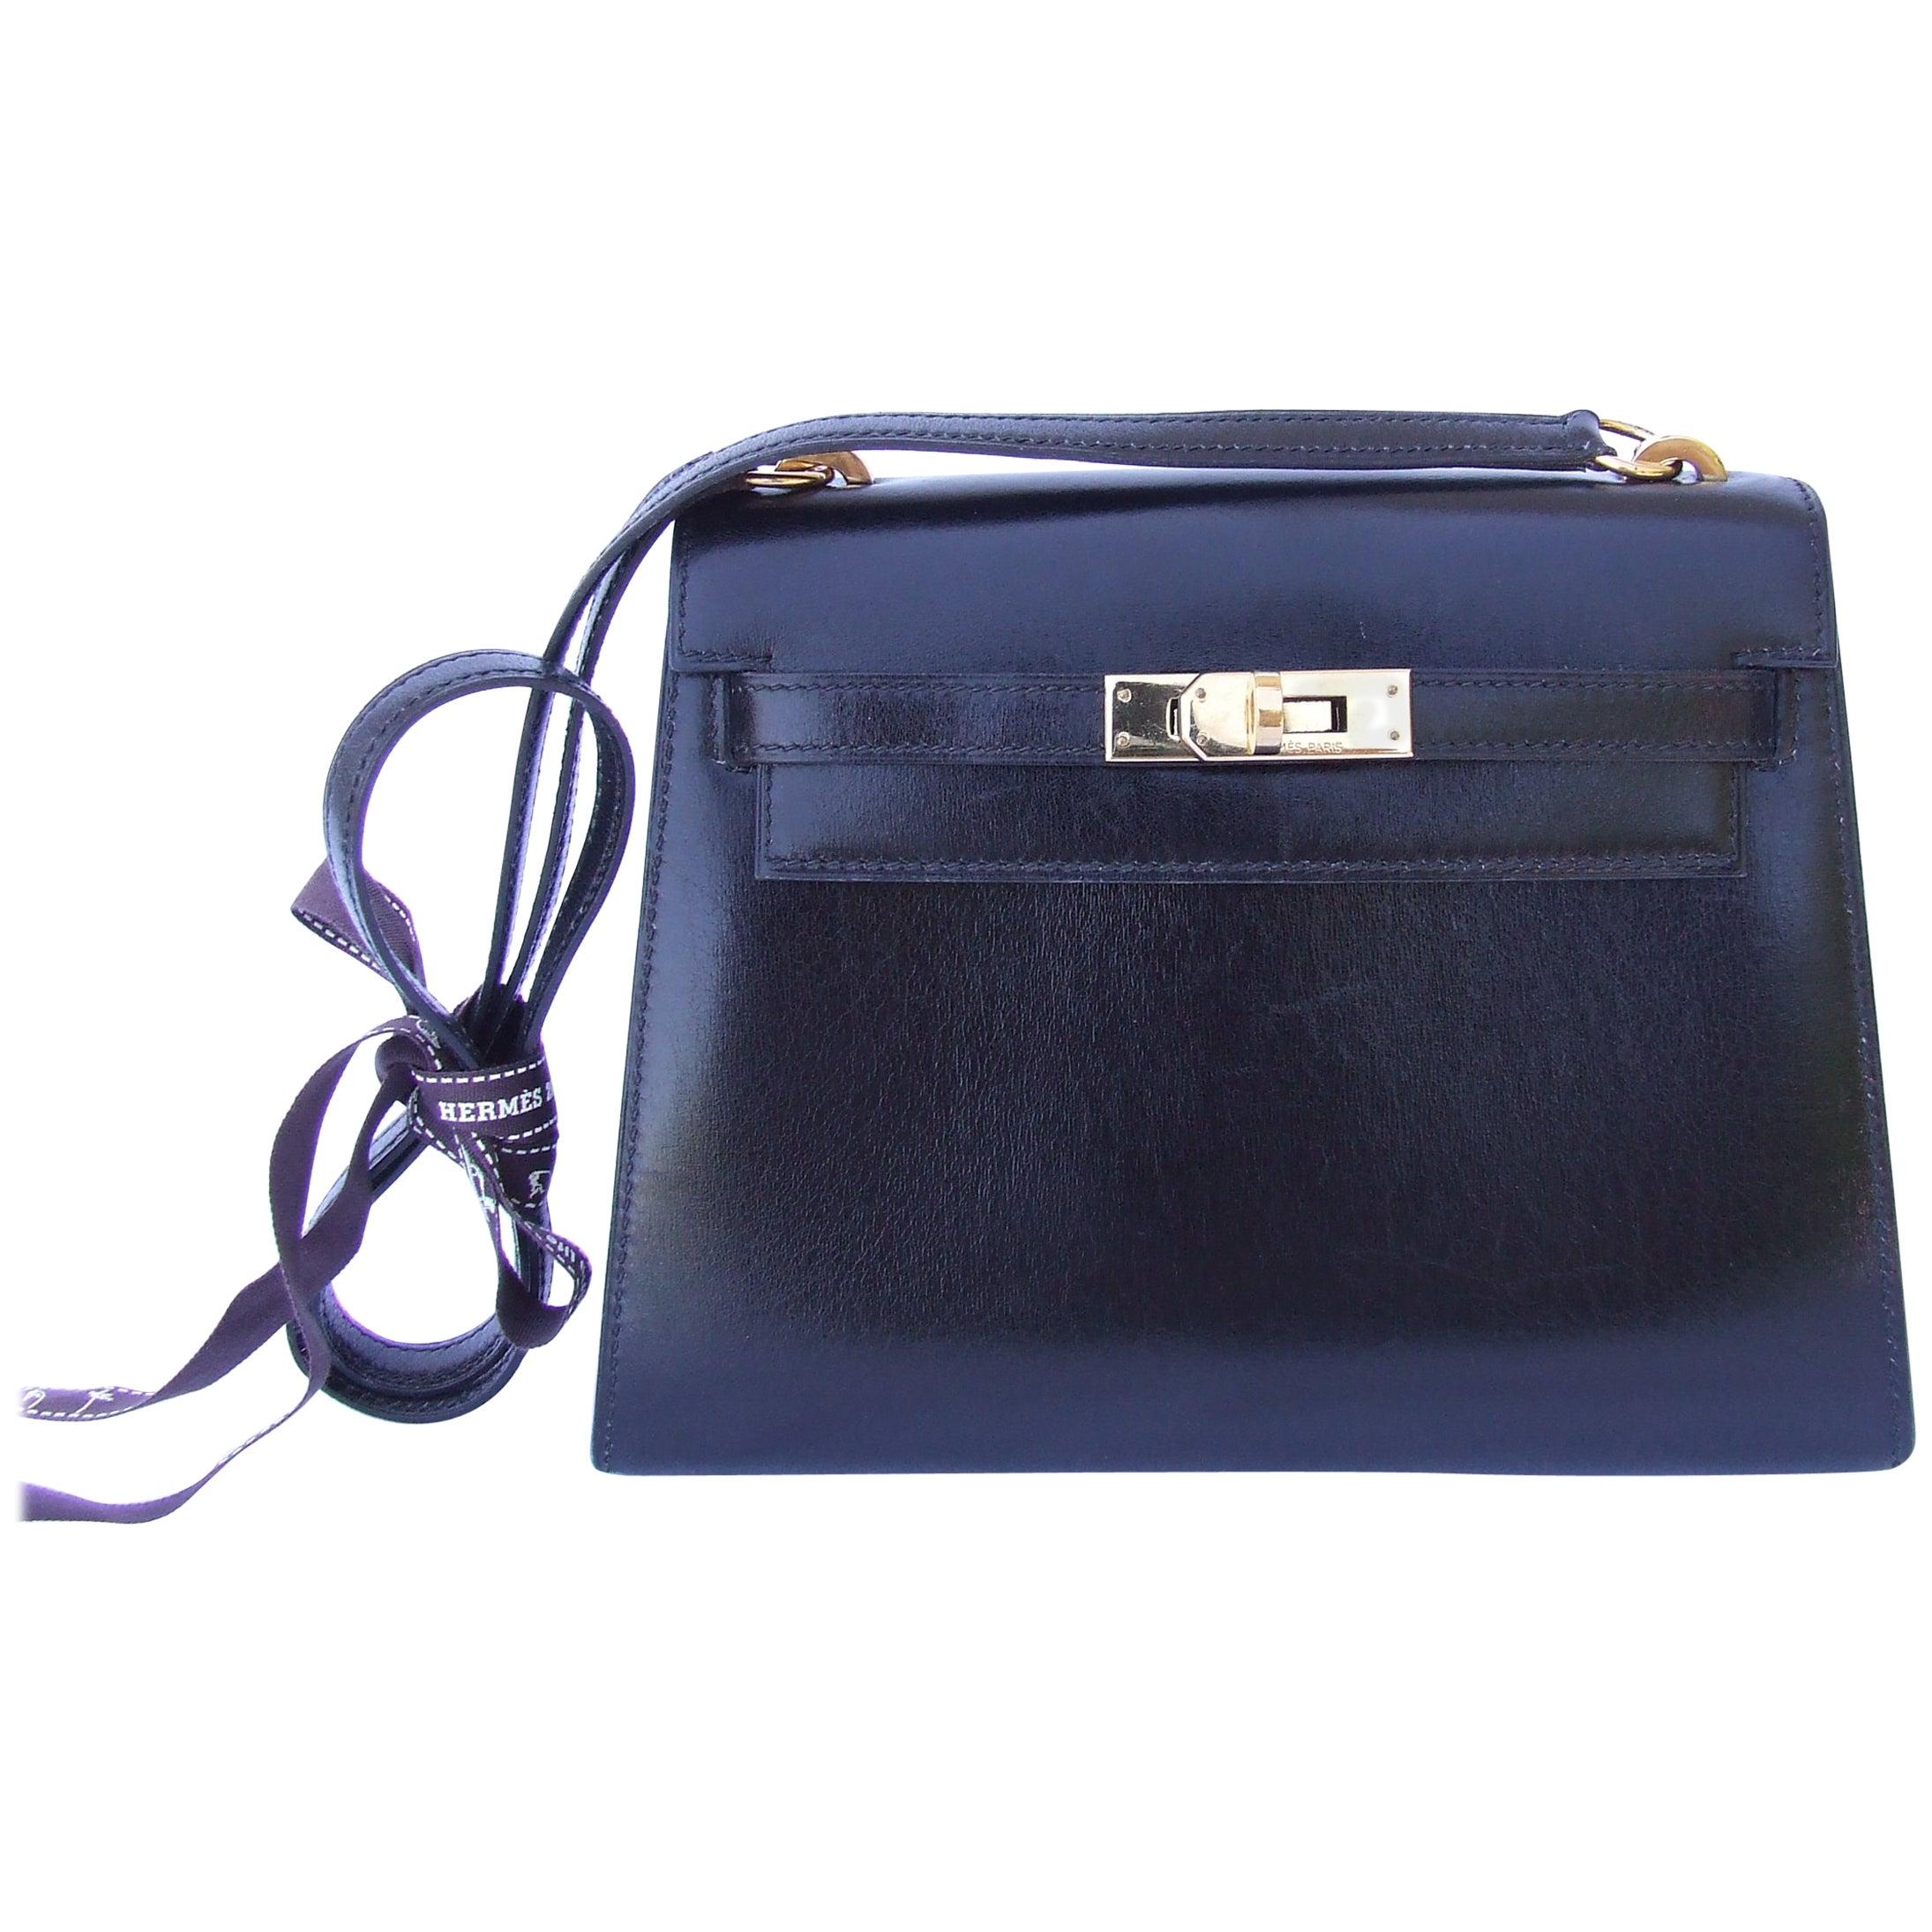 3c3e4270bd3 Hermès Vintage Mini Kelly Sellier Bag Black Box Leather Gold Hdw 20 cm at  1stdibs